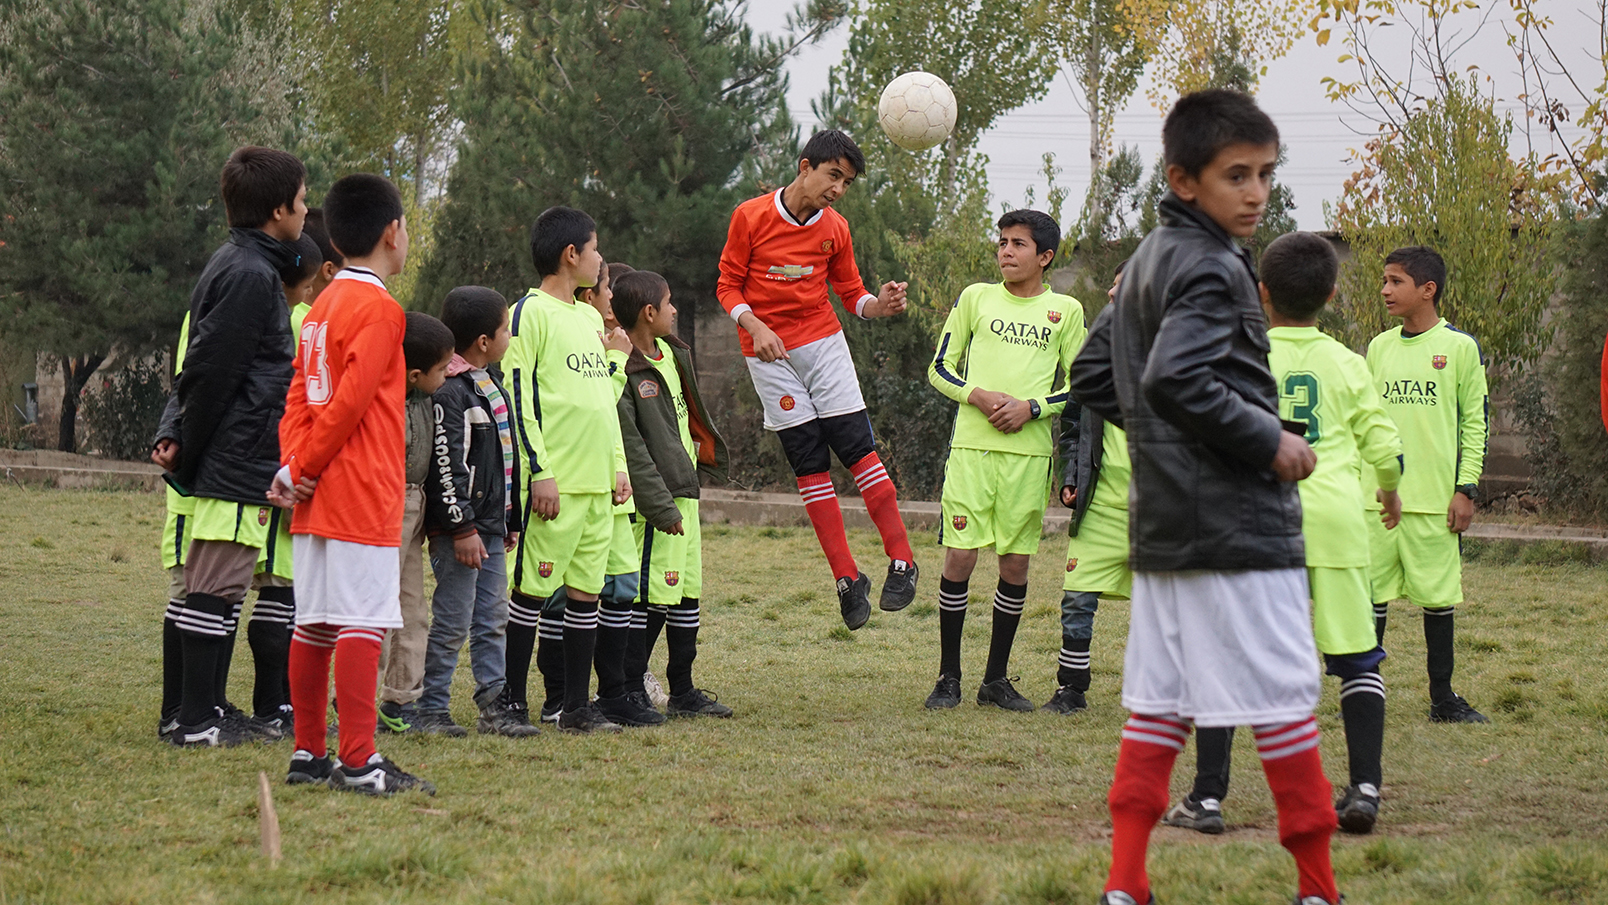 Conflictfood_PaiwandENoor_football3